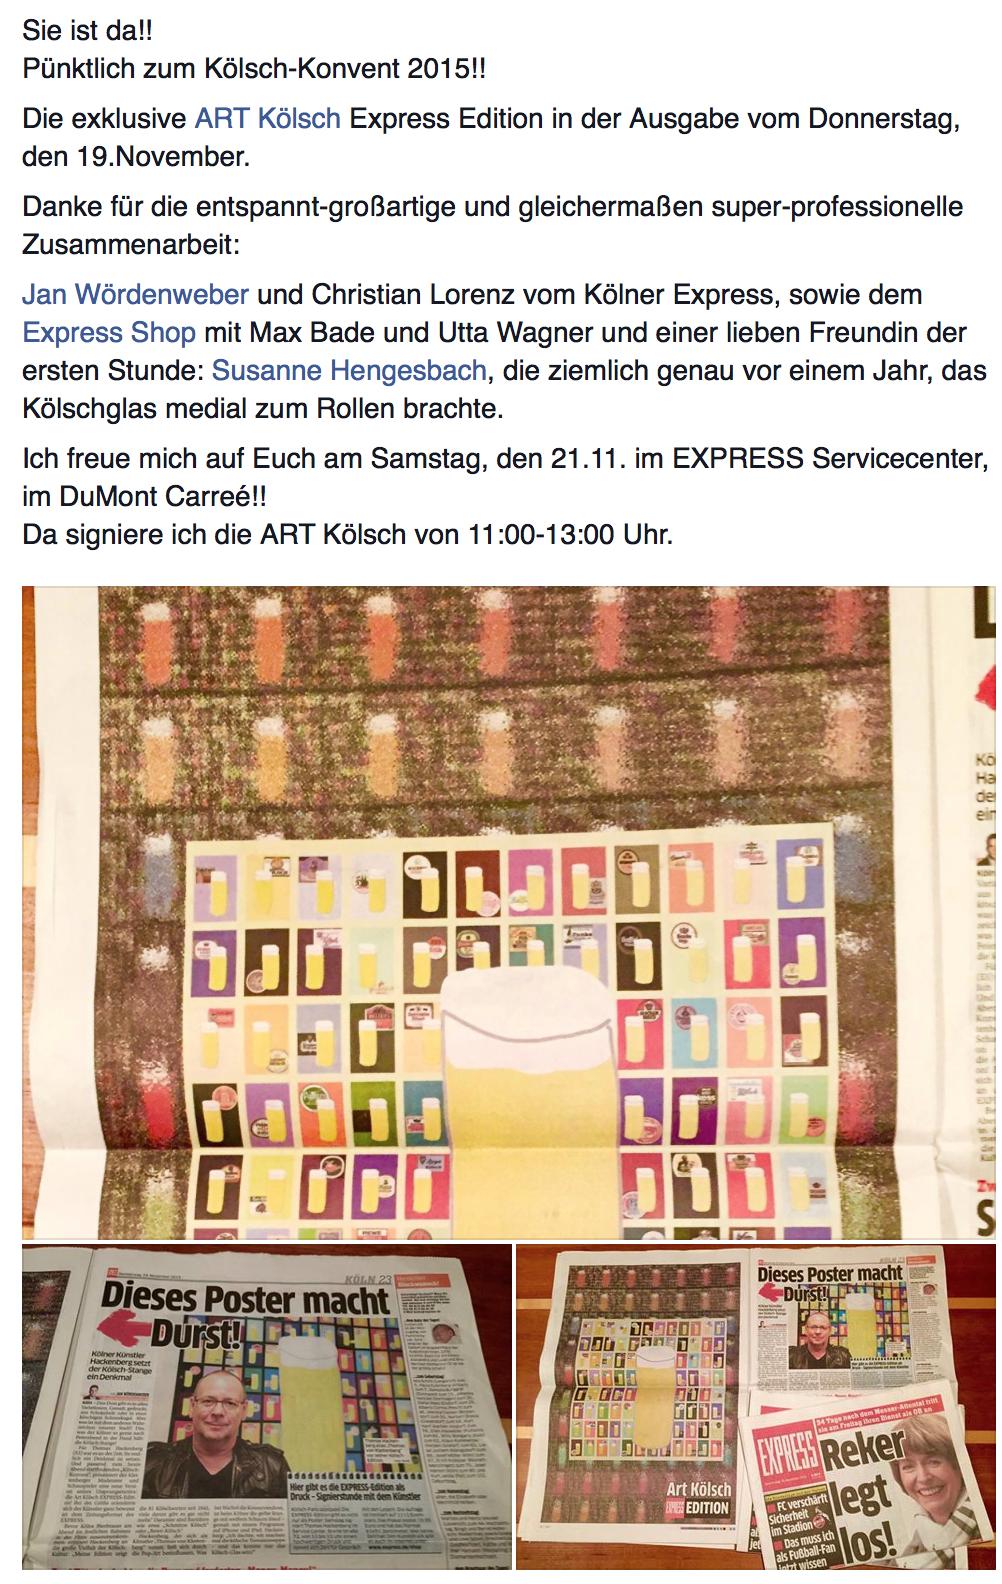 Art Print In Cologne's No 1 Newspaper